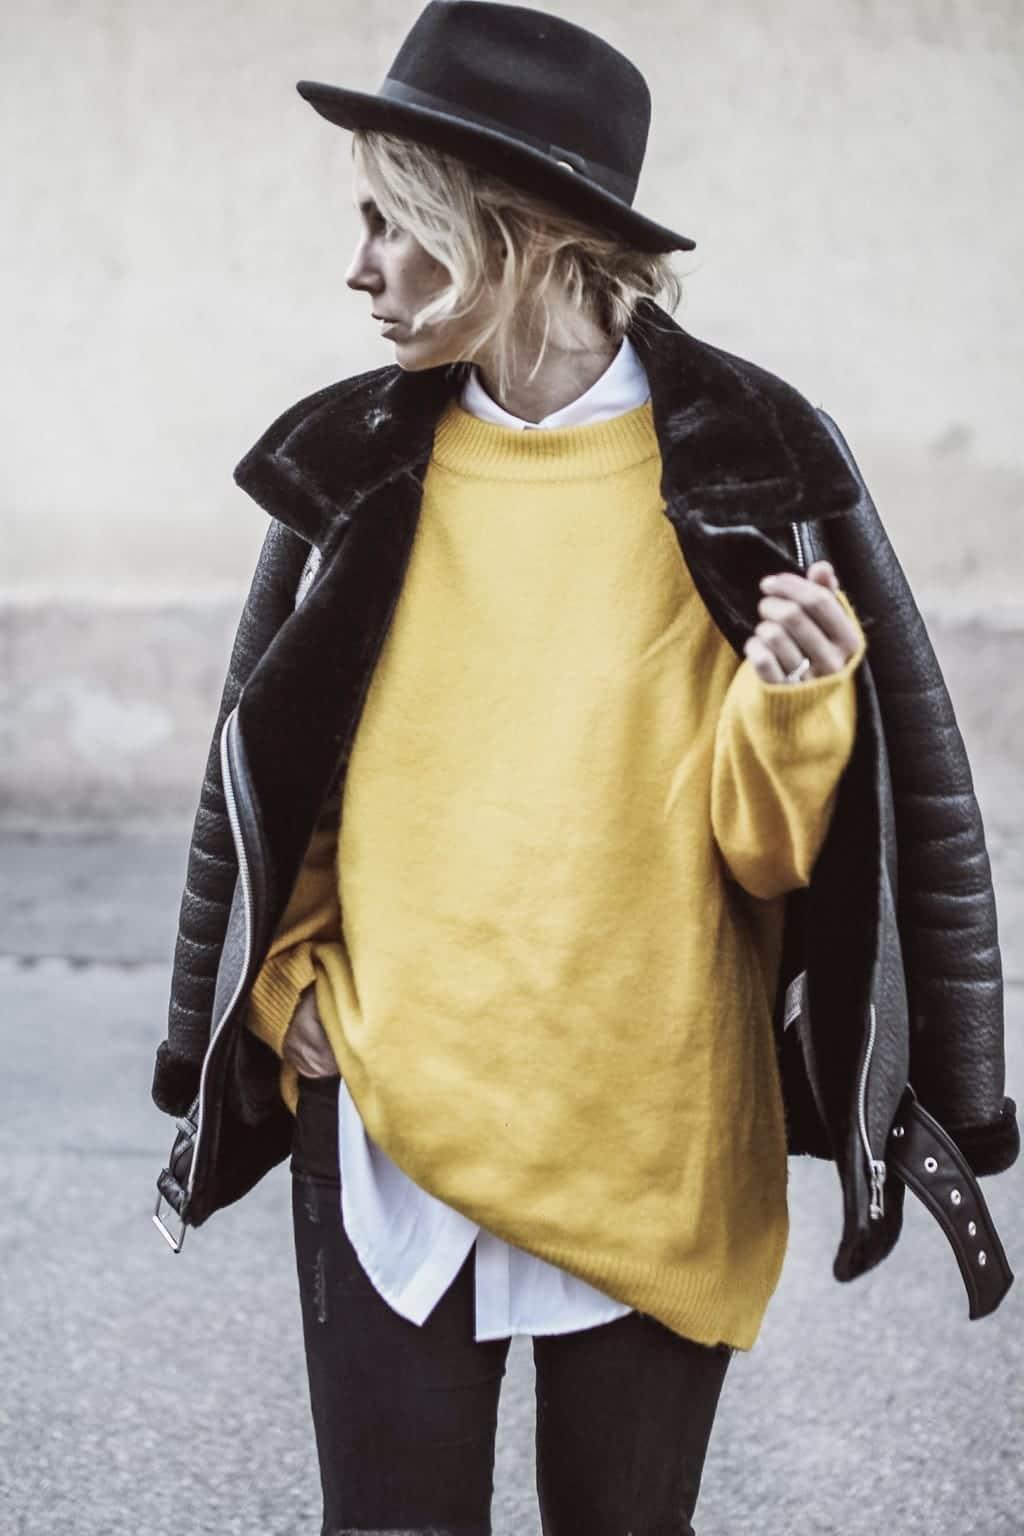 ck-constantlyk-com-karin-kaswurm-lammfelljacke-street-style-fashion-2054